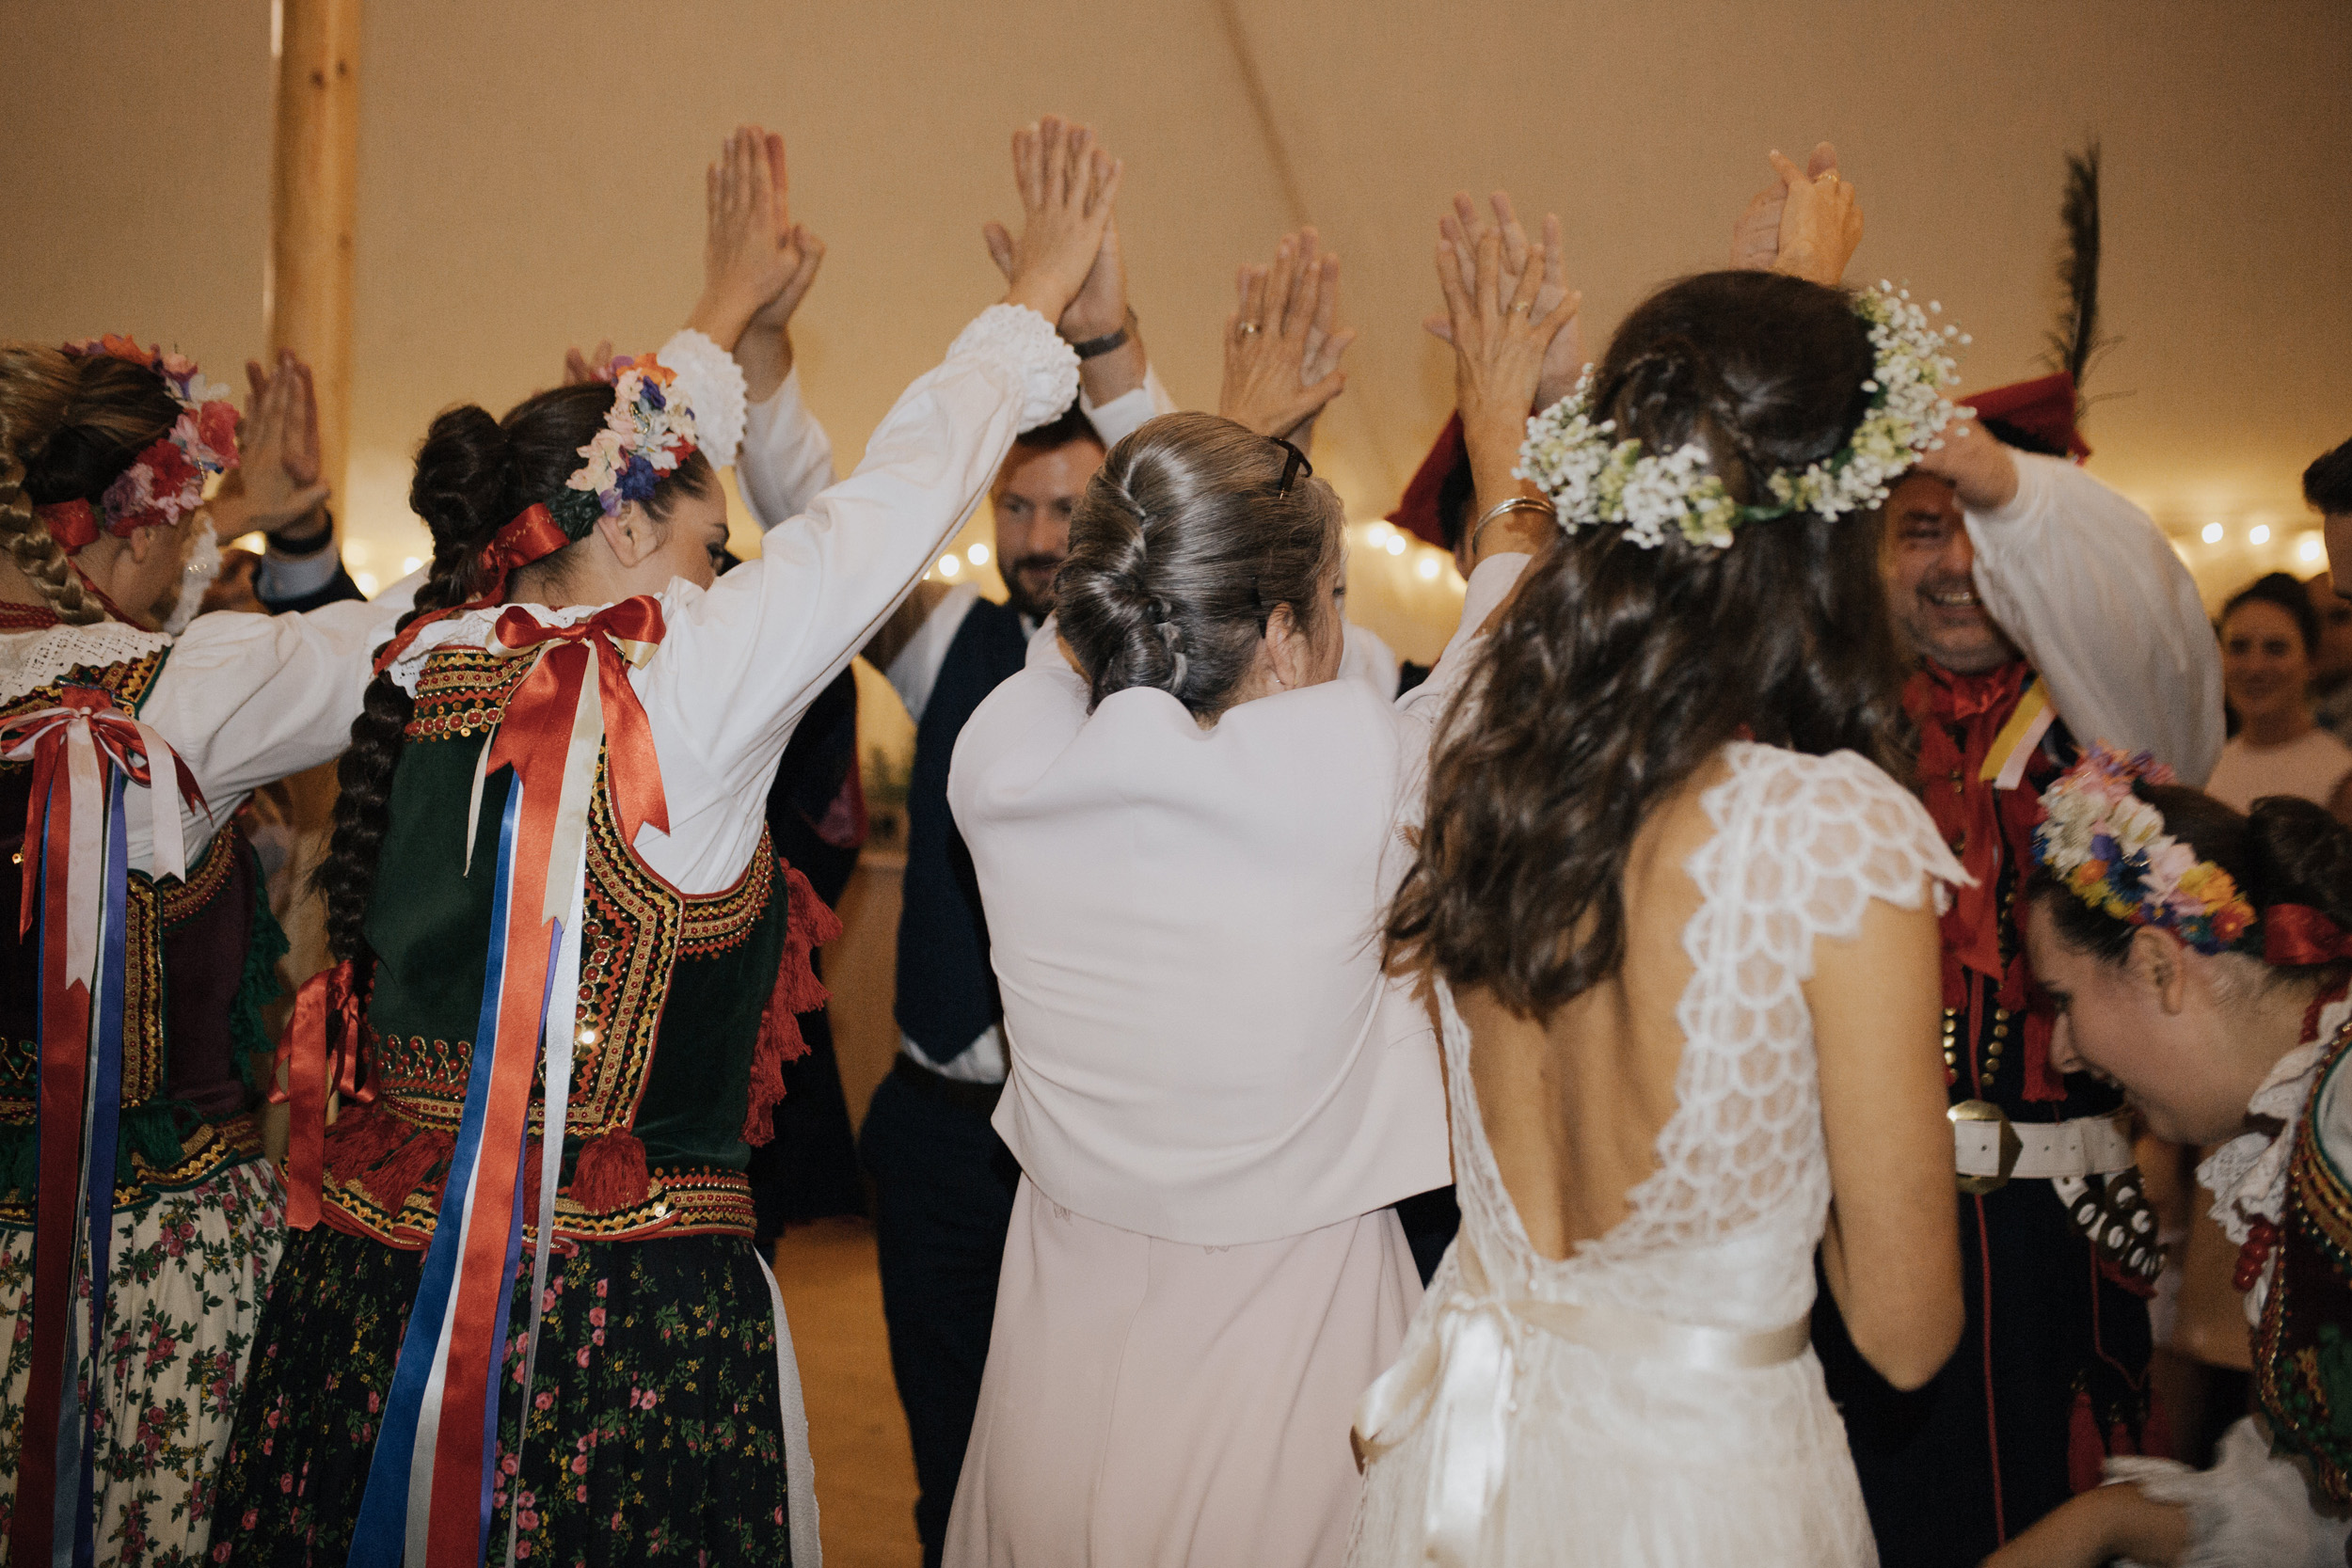 Joasia-Kate-Beaumont-Bohemian-Lace-Wedding-Dress-Peak-District-Sheffield-Wedding-58.jpg